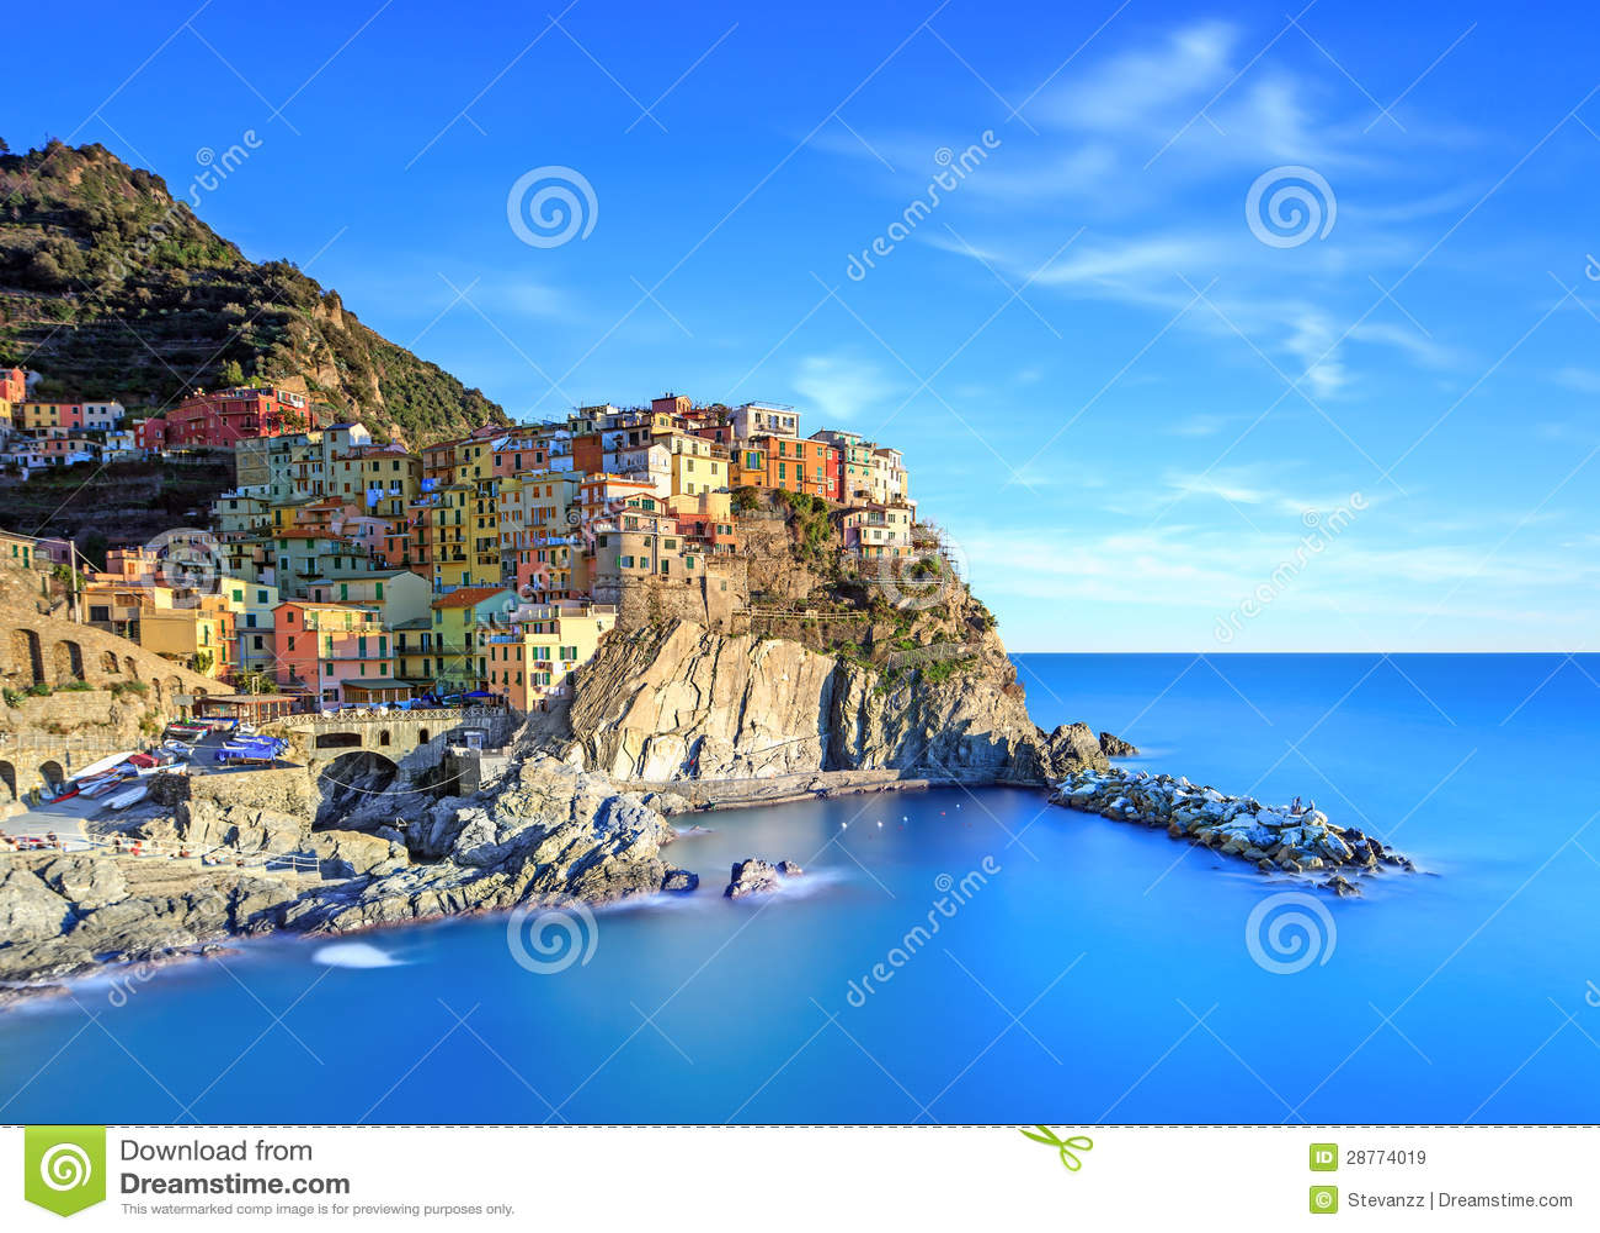 sea monterosso italy - photo #38